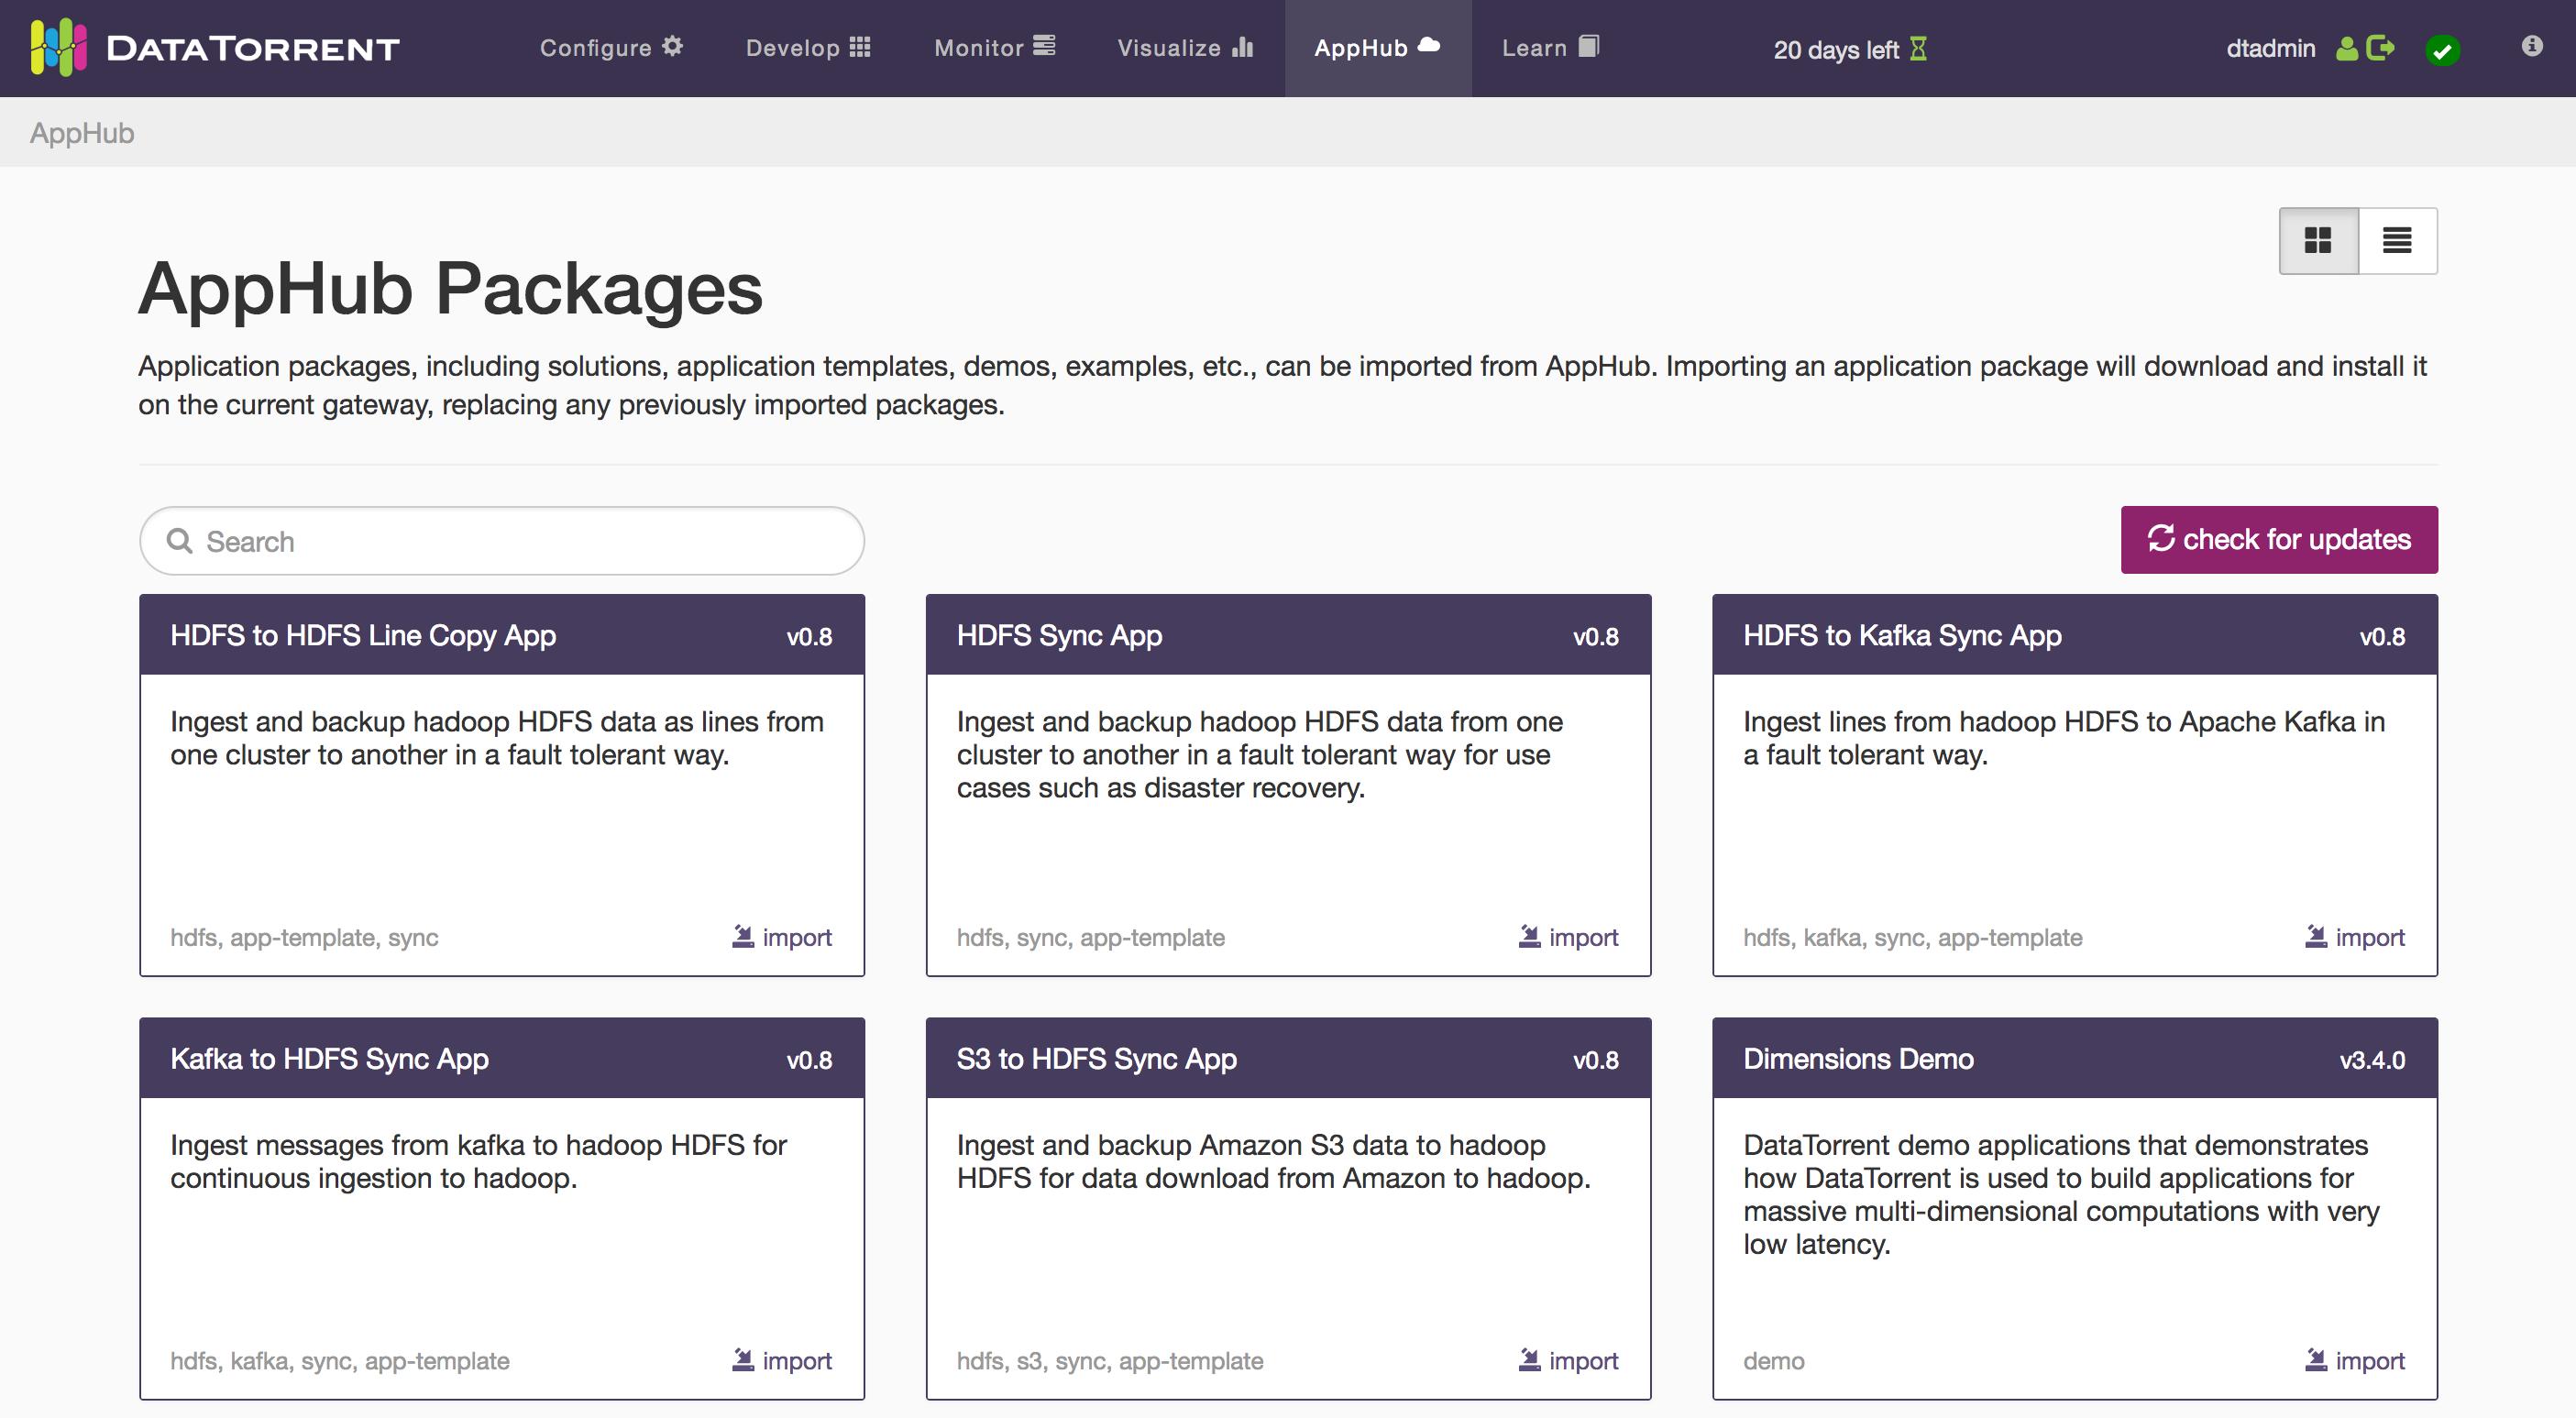 apex applications download